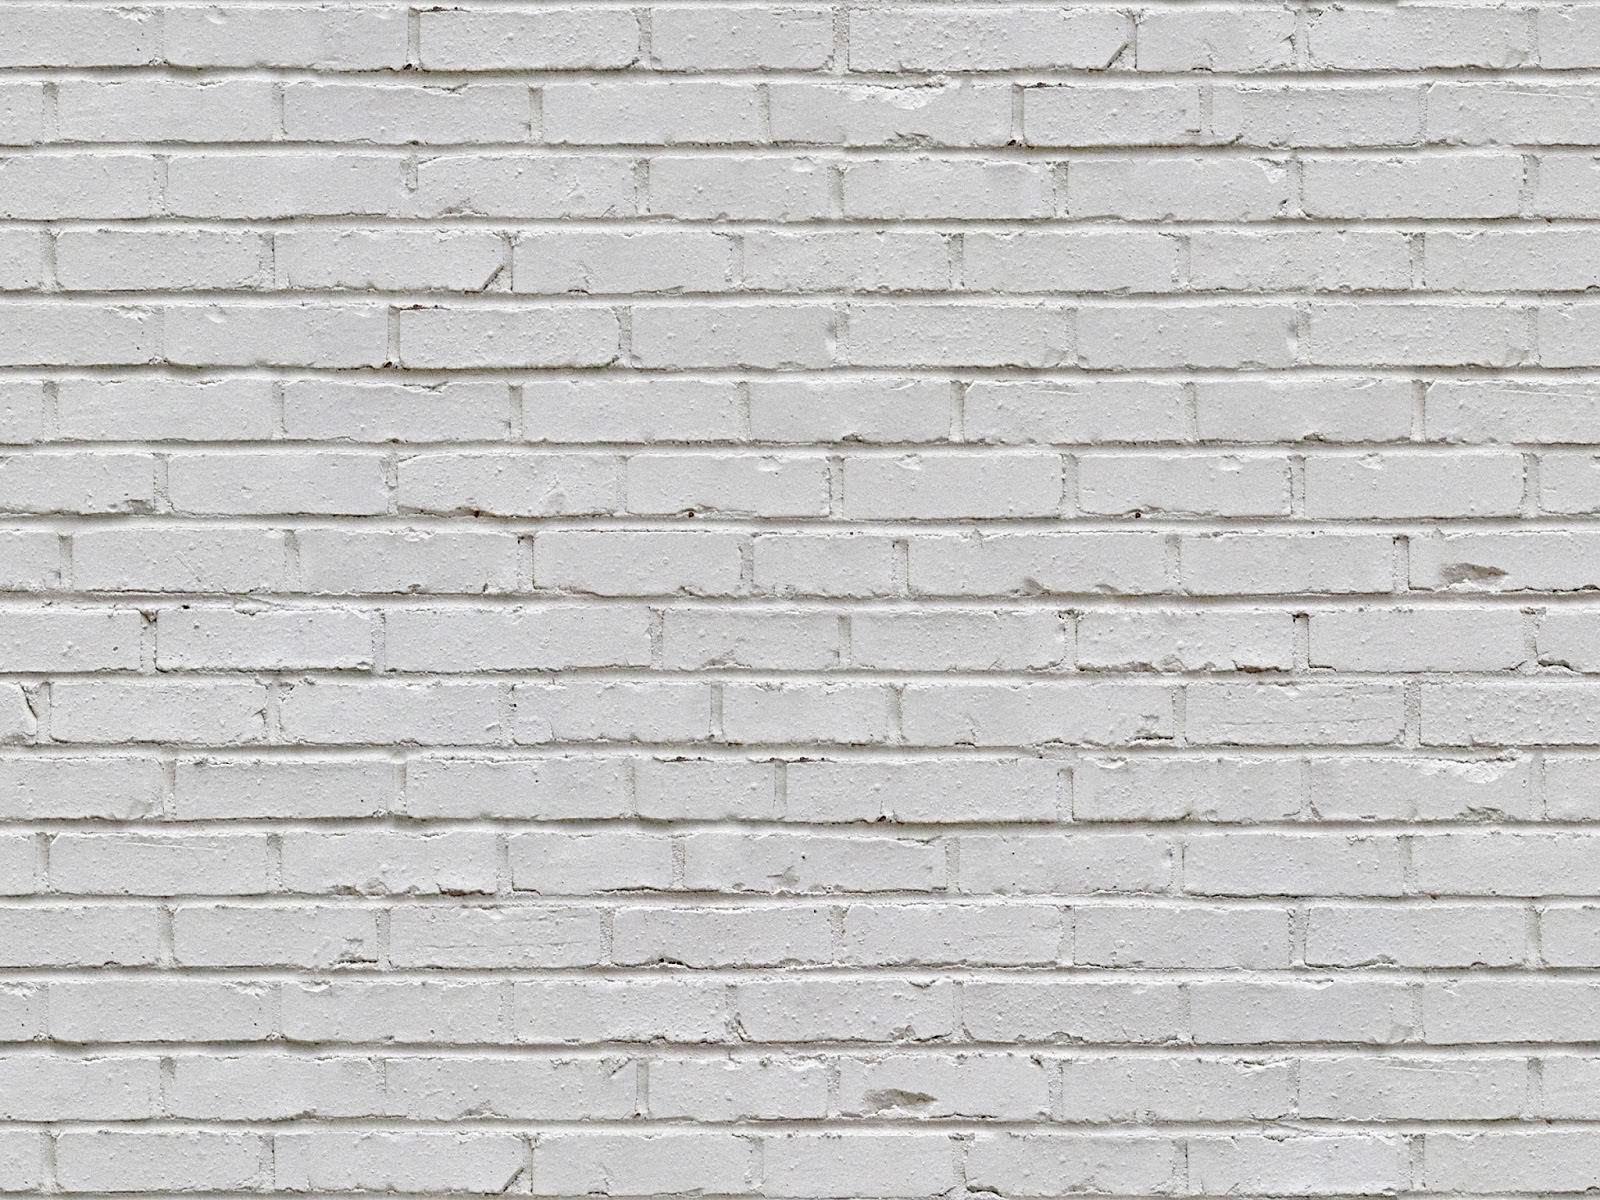 15 Free White Brick Texture Designs